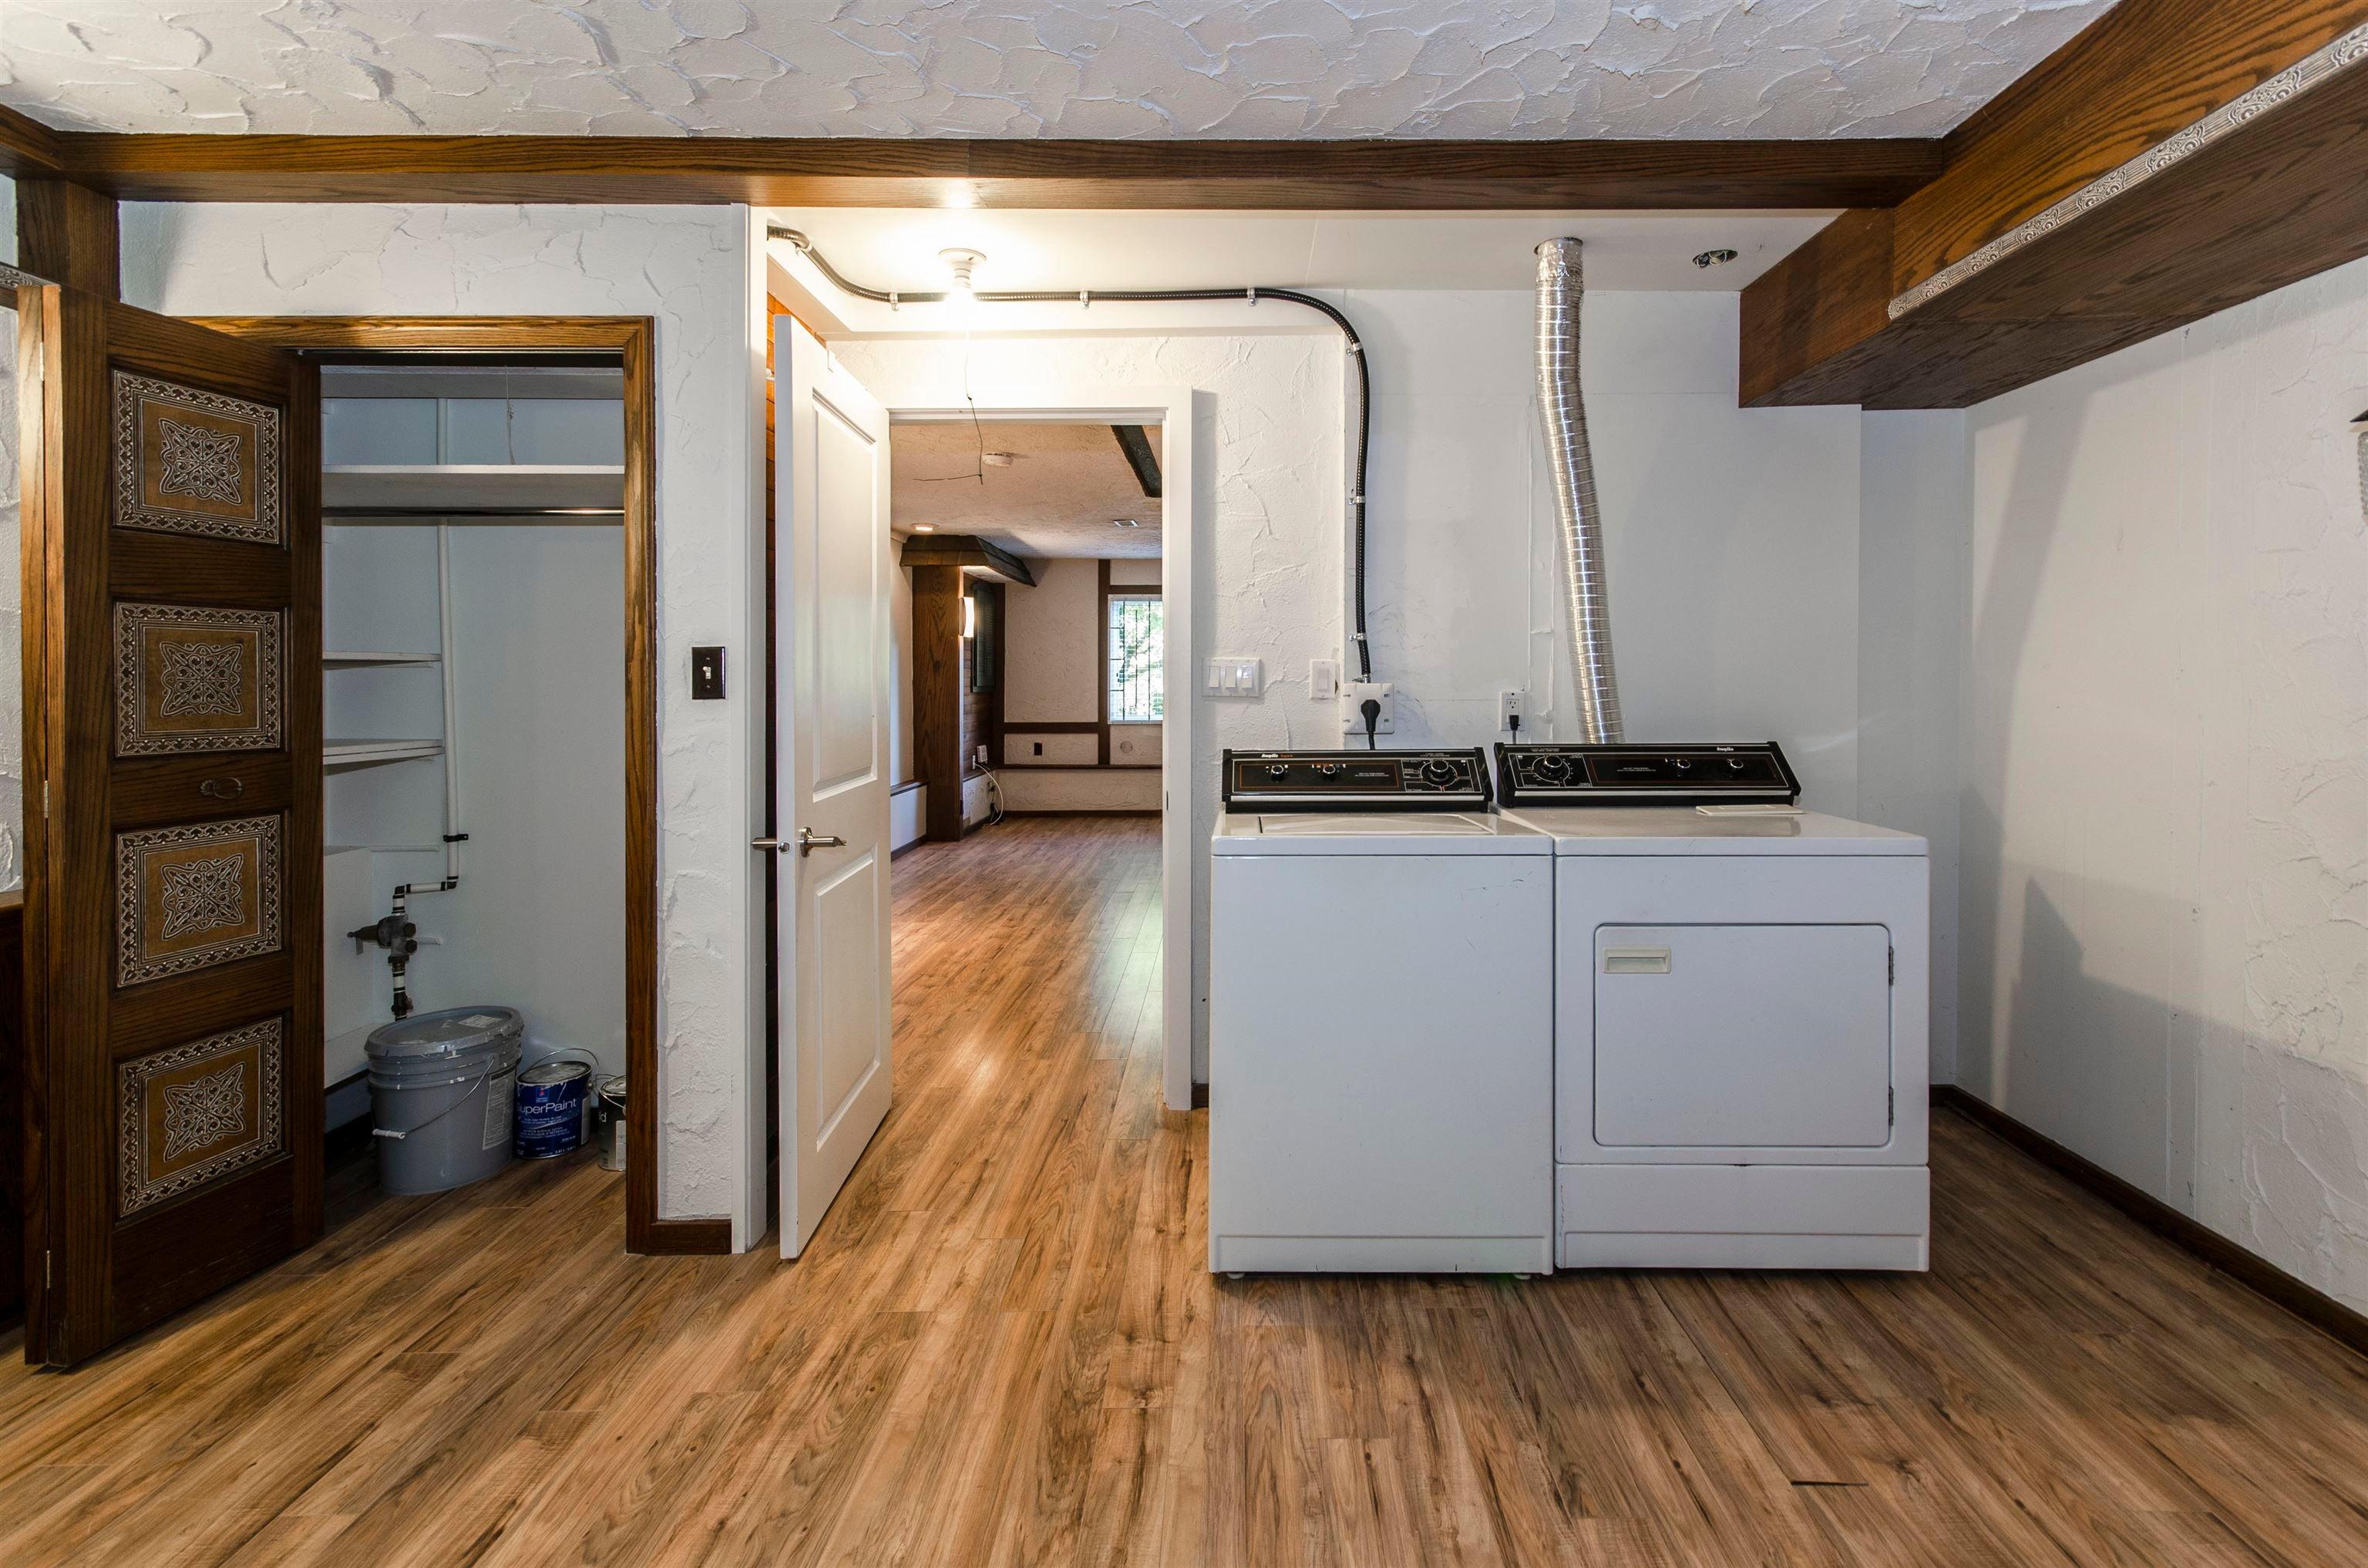 3785 REGENT AVENUE - Upper Lonsdale House/Single Family for sale, 4 Bedrooms (R2617648) - #13